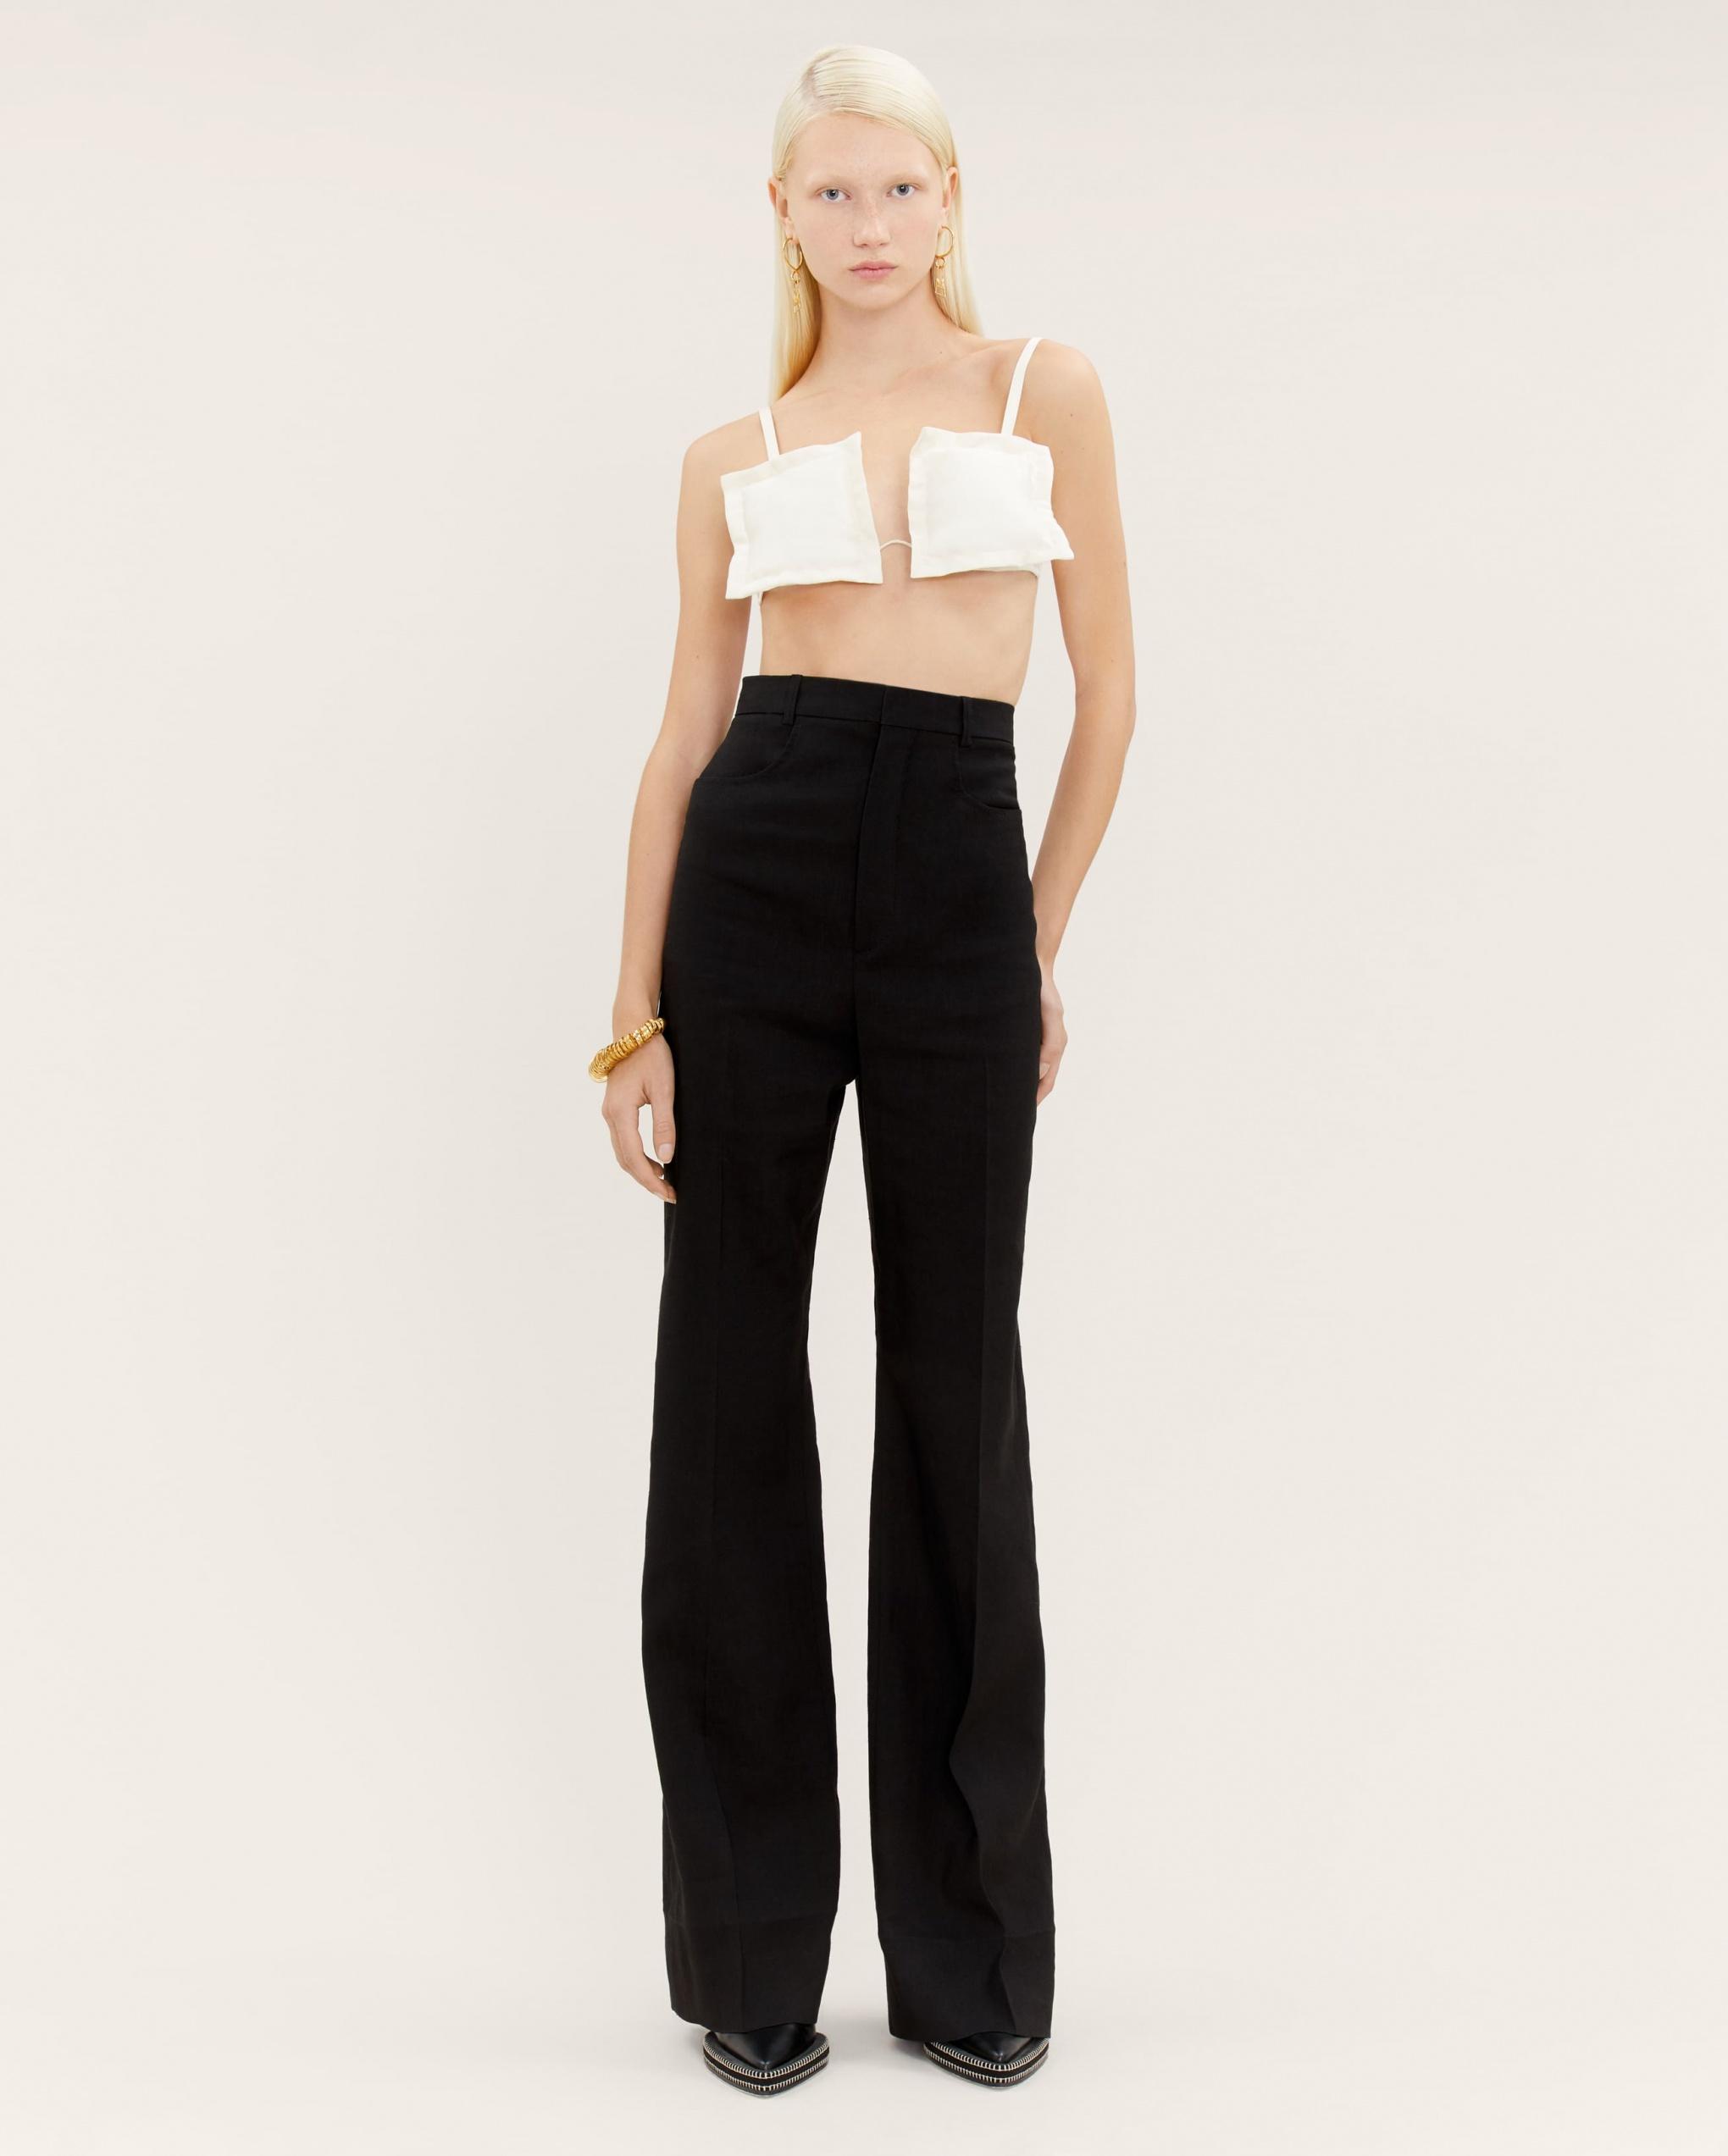 Le pantalon Sauge